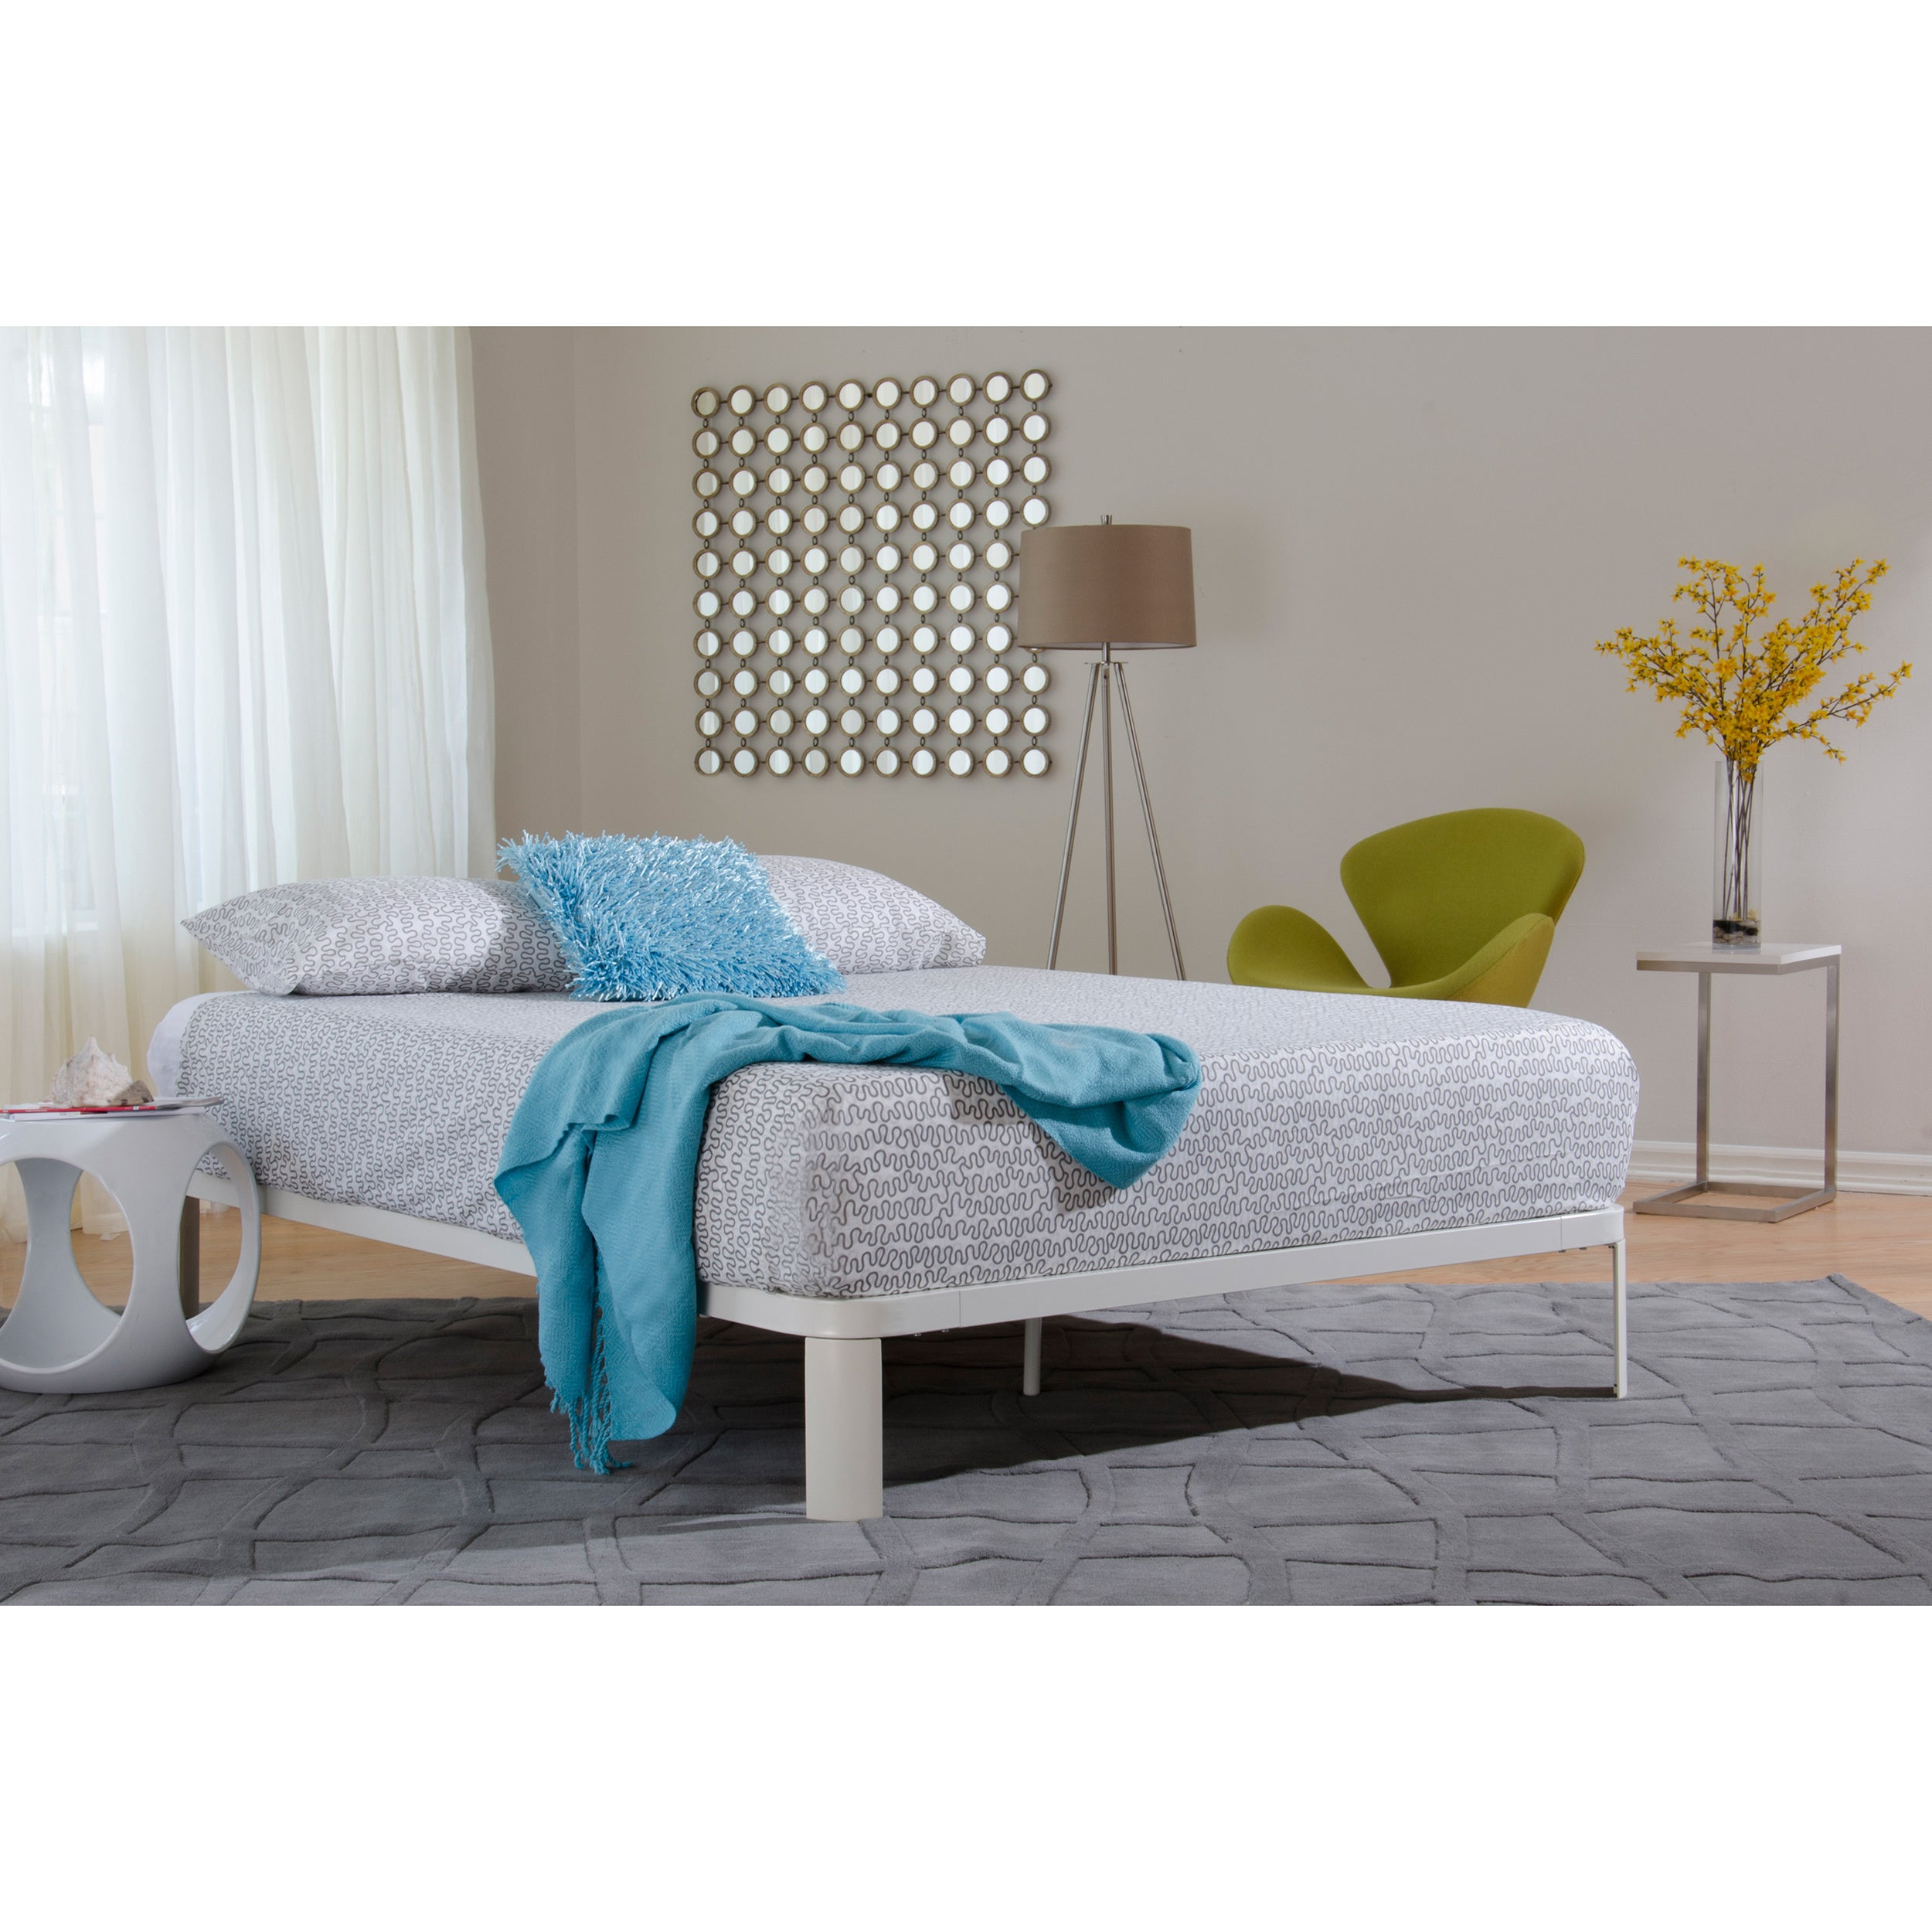 Lunar White Metal/ Wood Platform Bed II